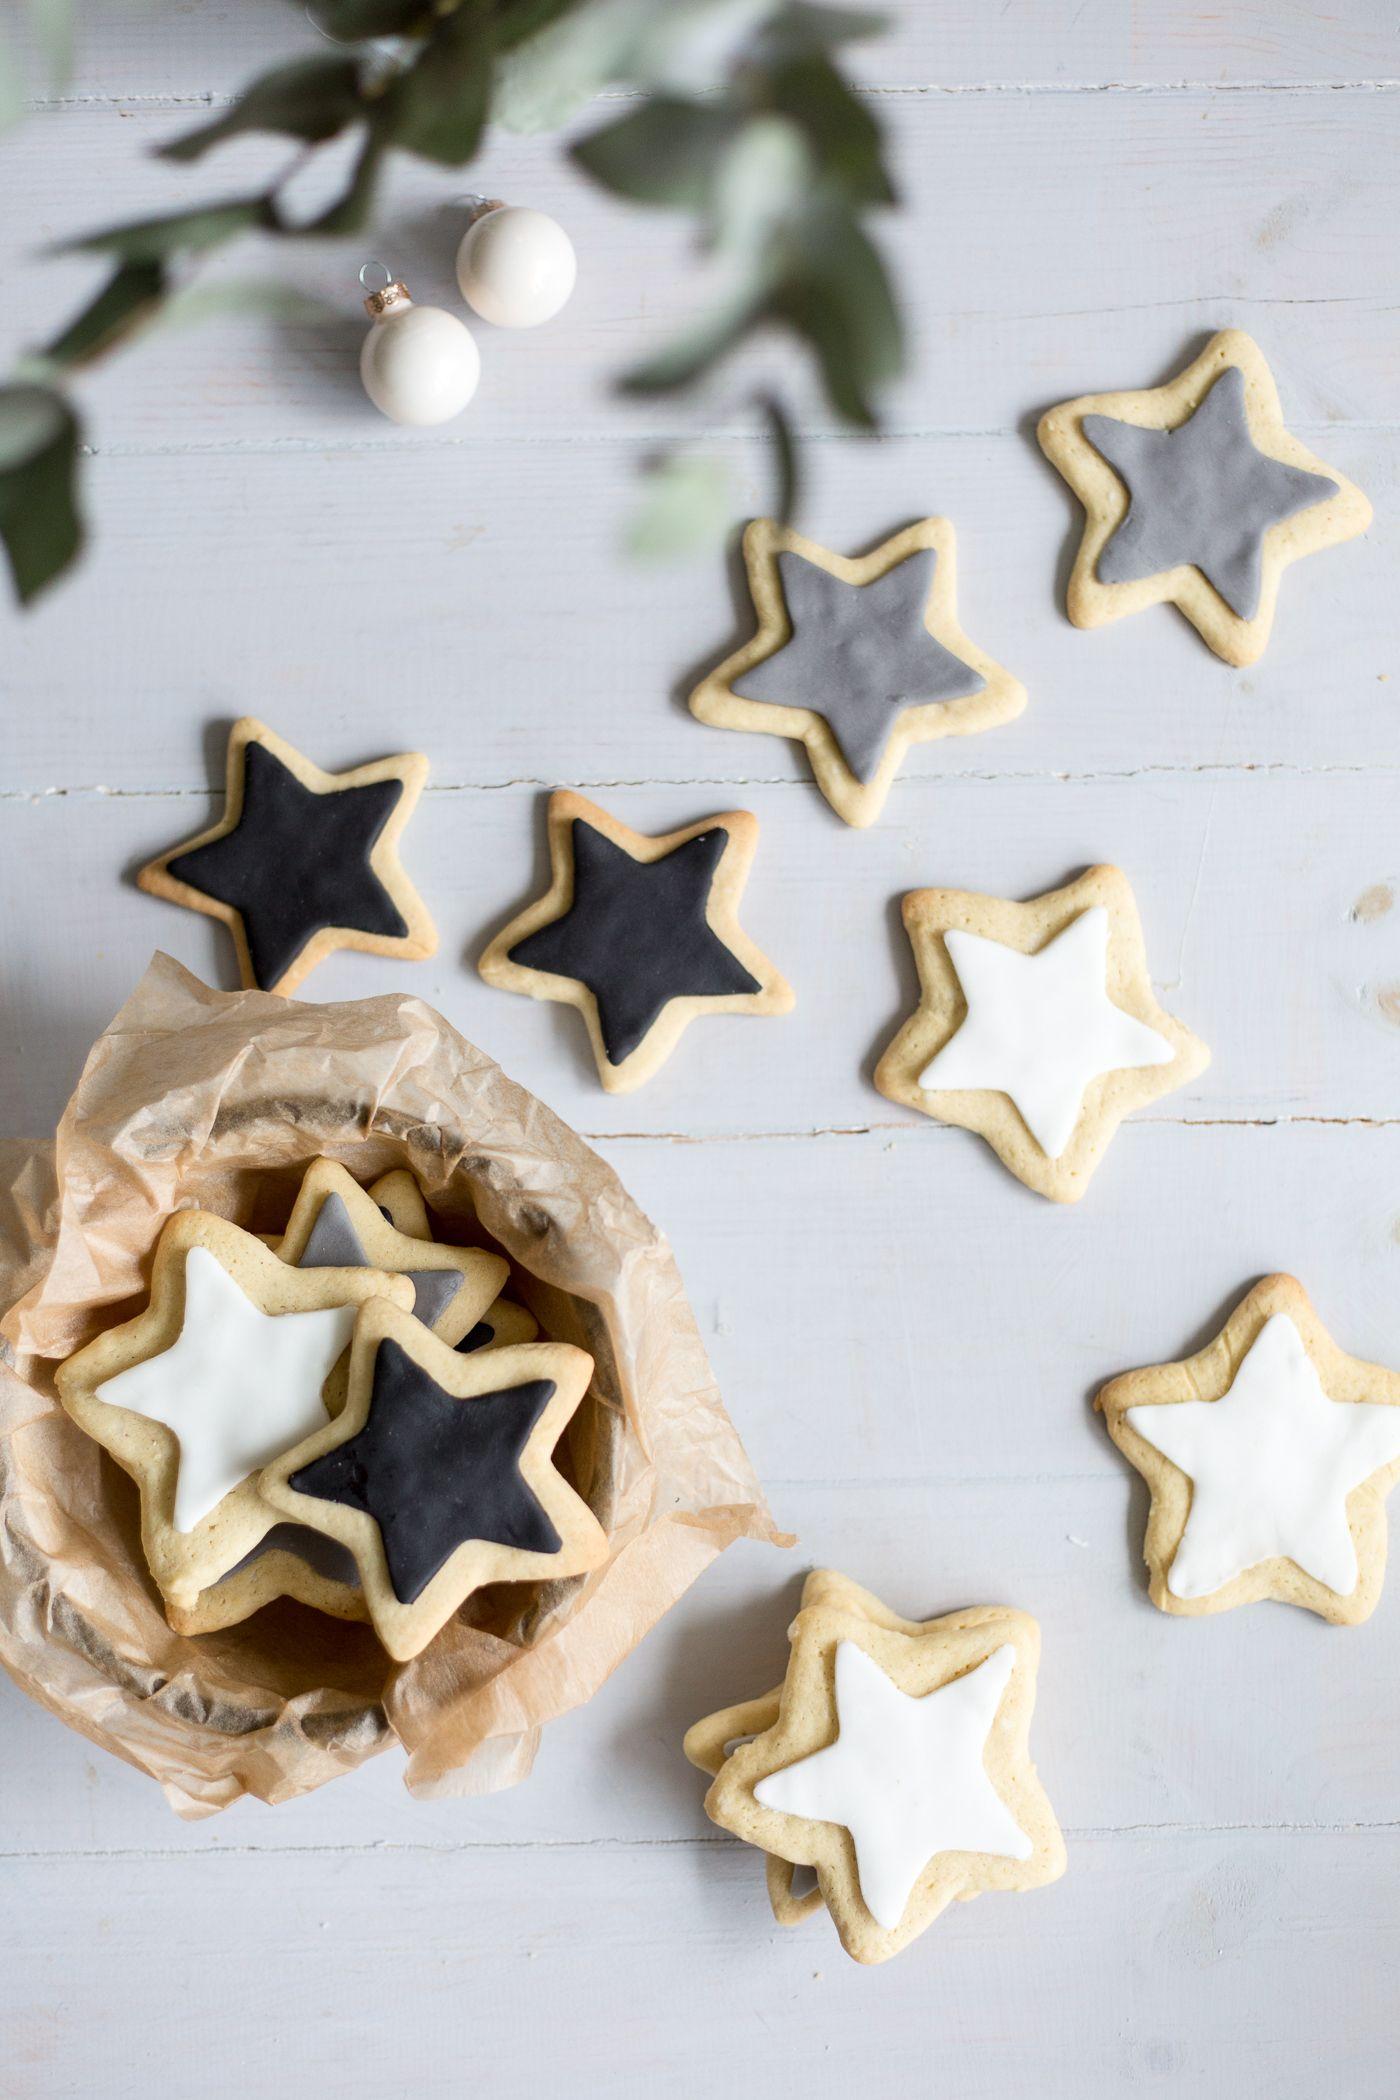 Christmas Wishes & Monochrome Sugar Cookies (Vegan Friendly)